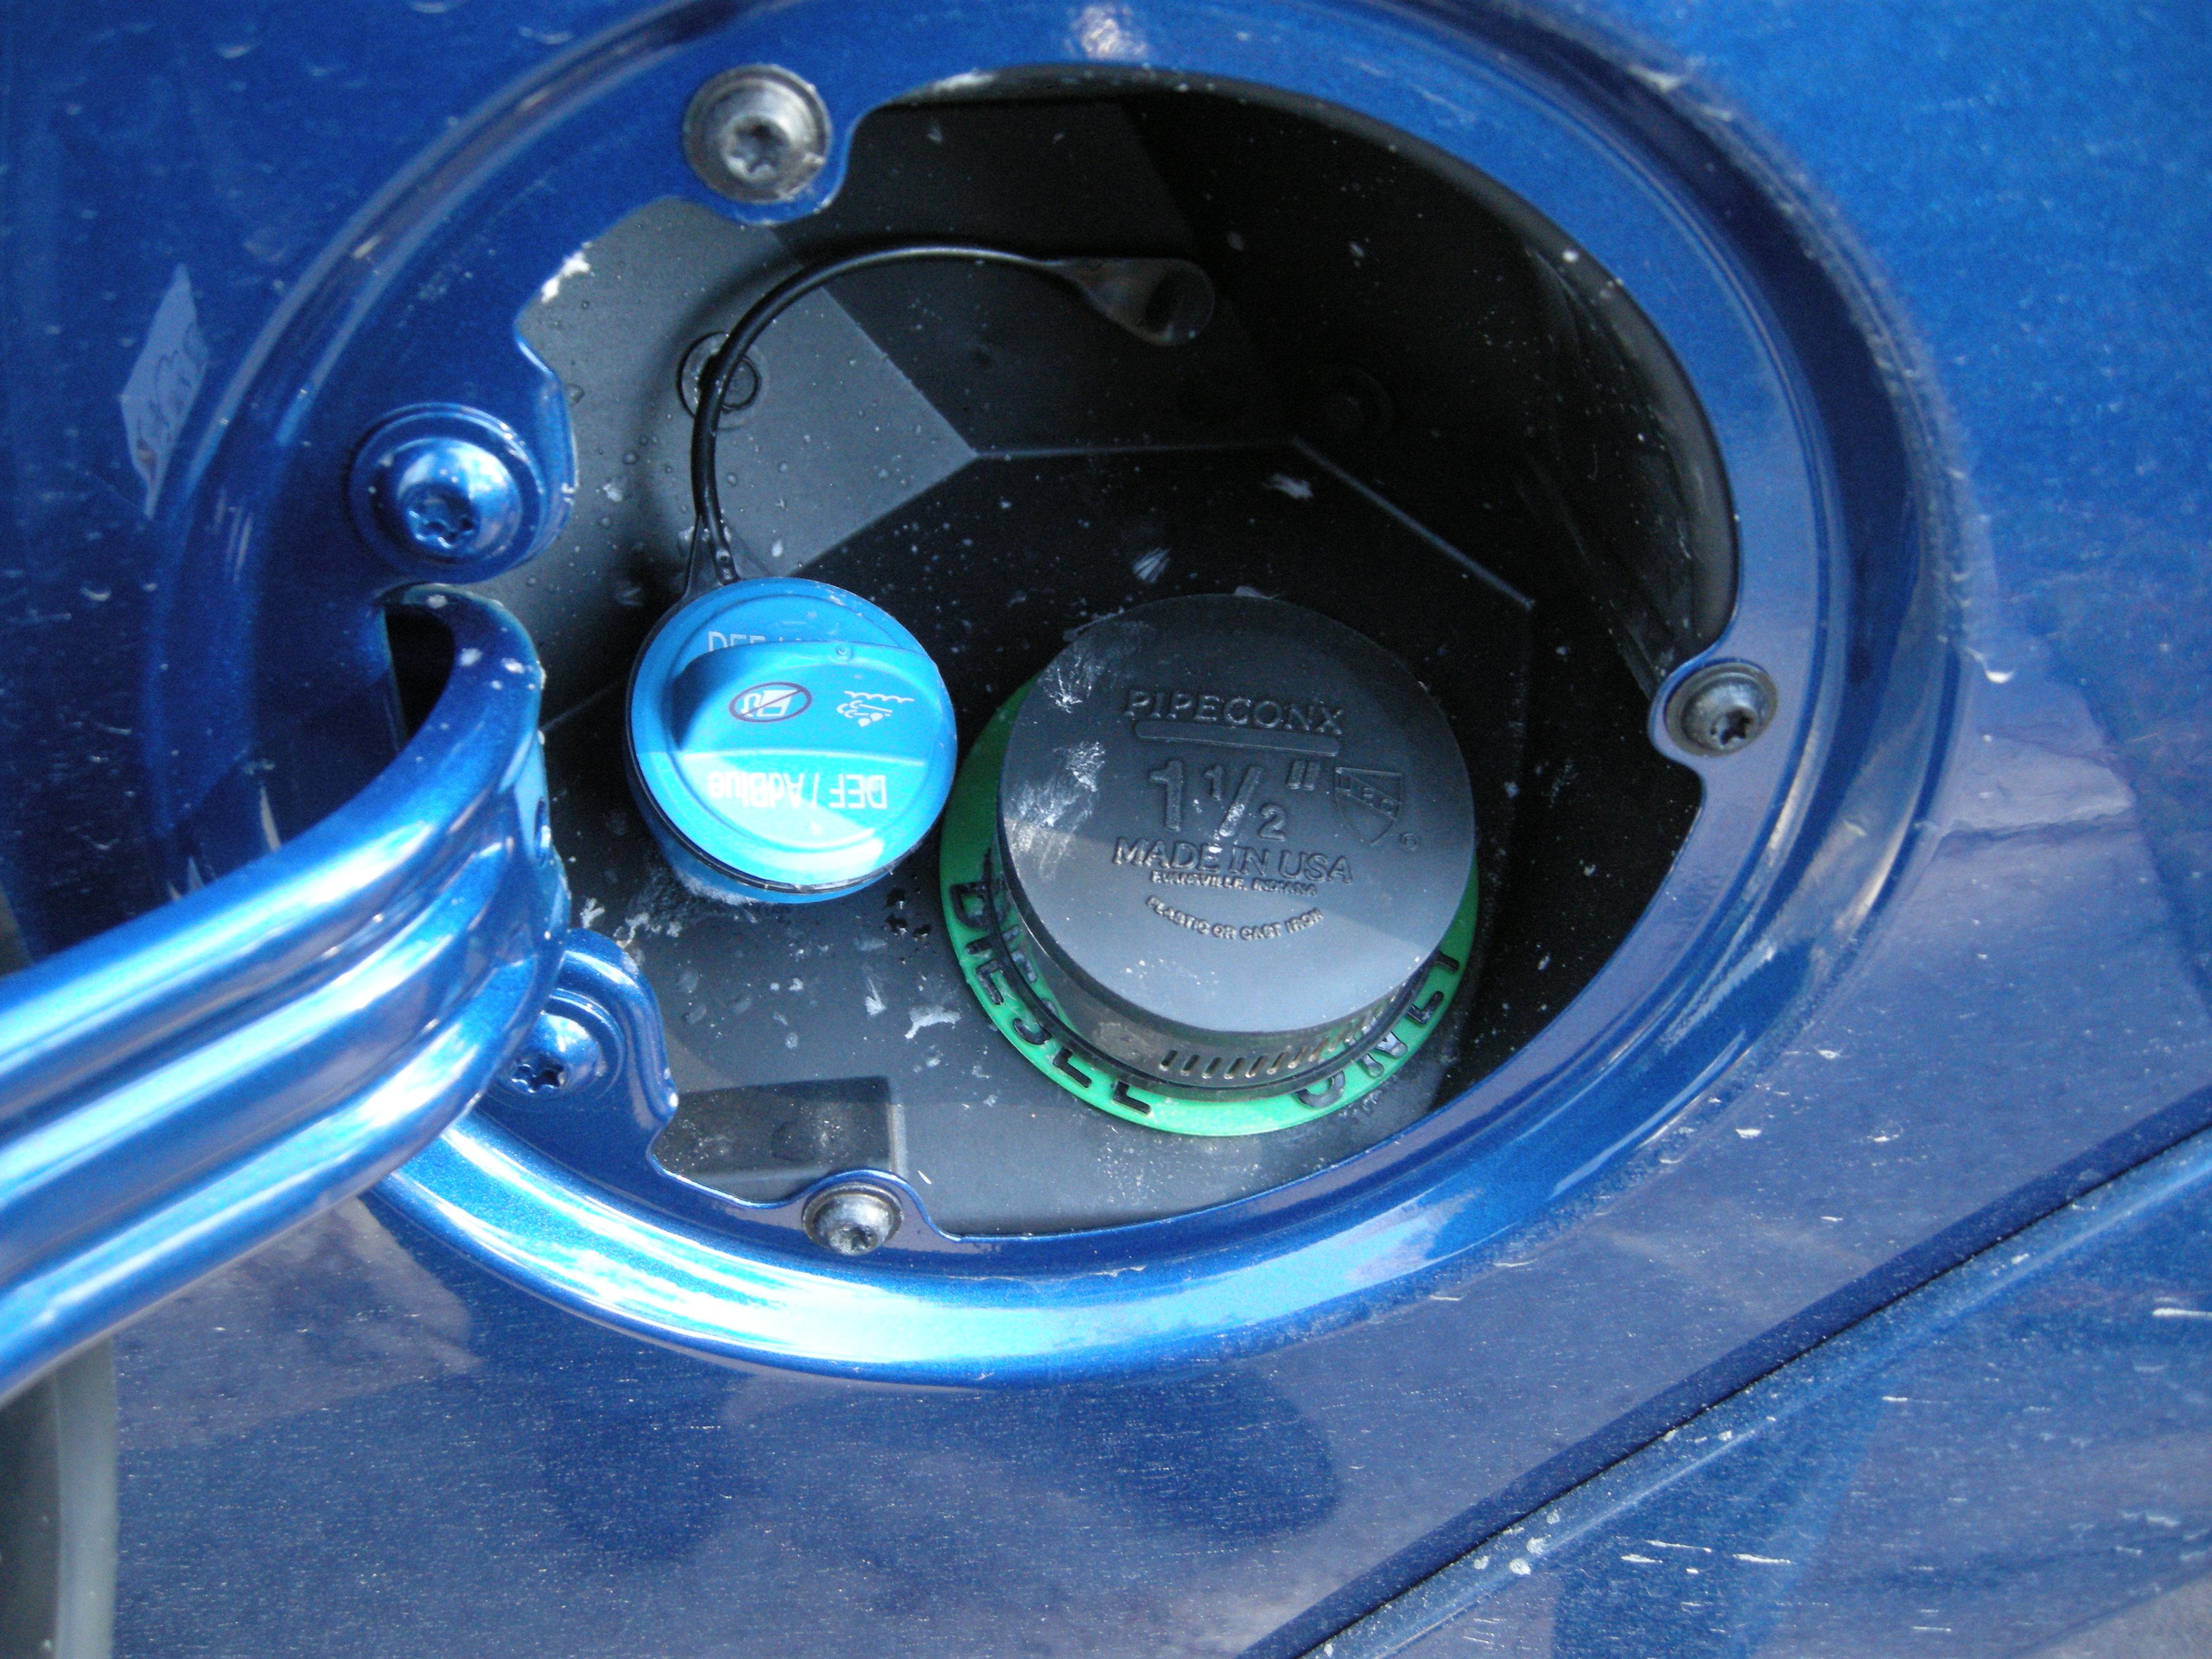 Use of fuel cap on capless Rams!-dscn0132.jpg